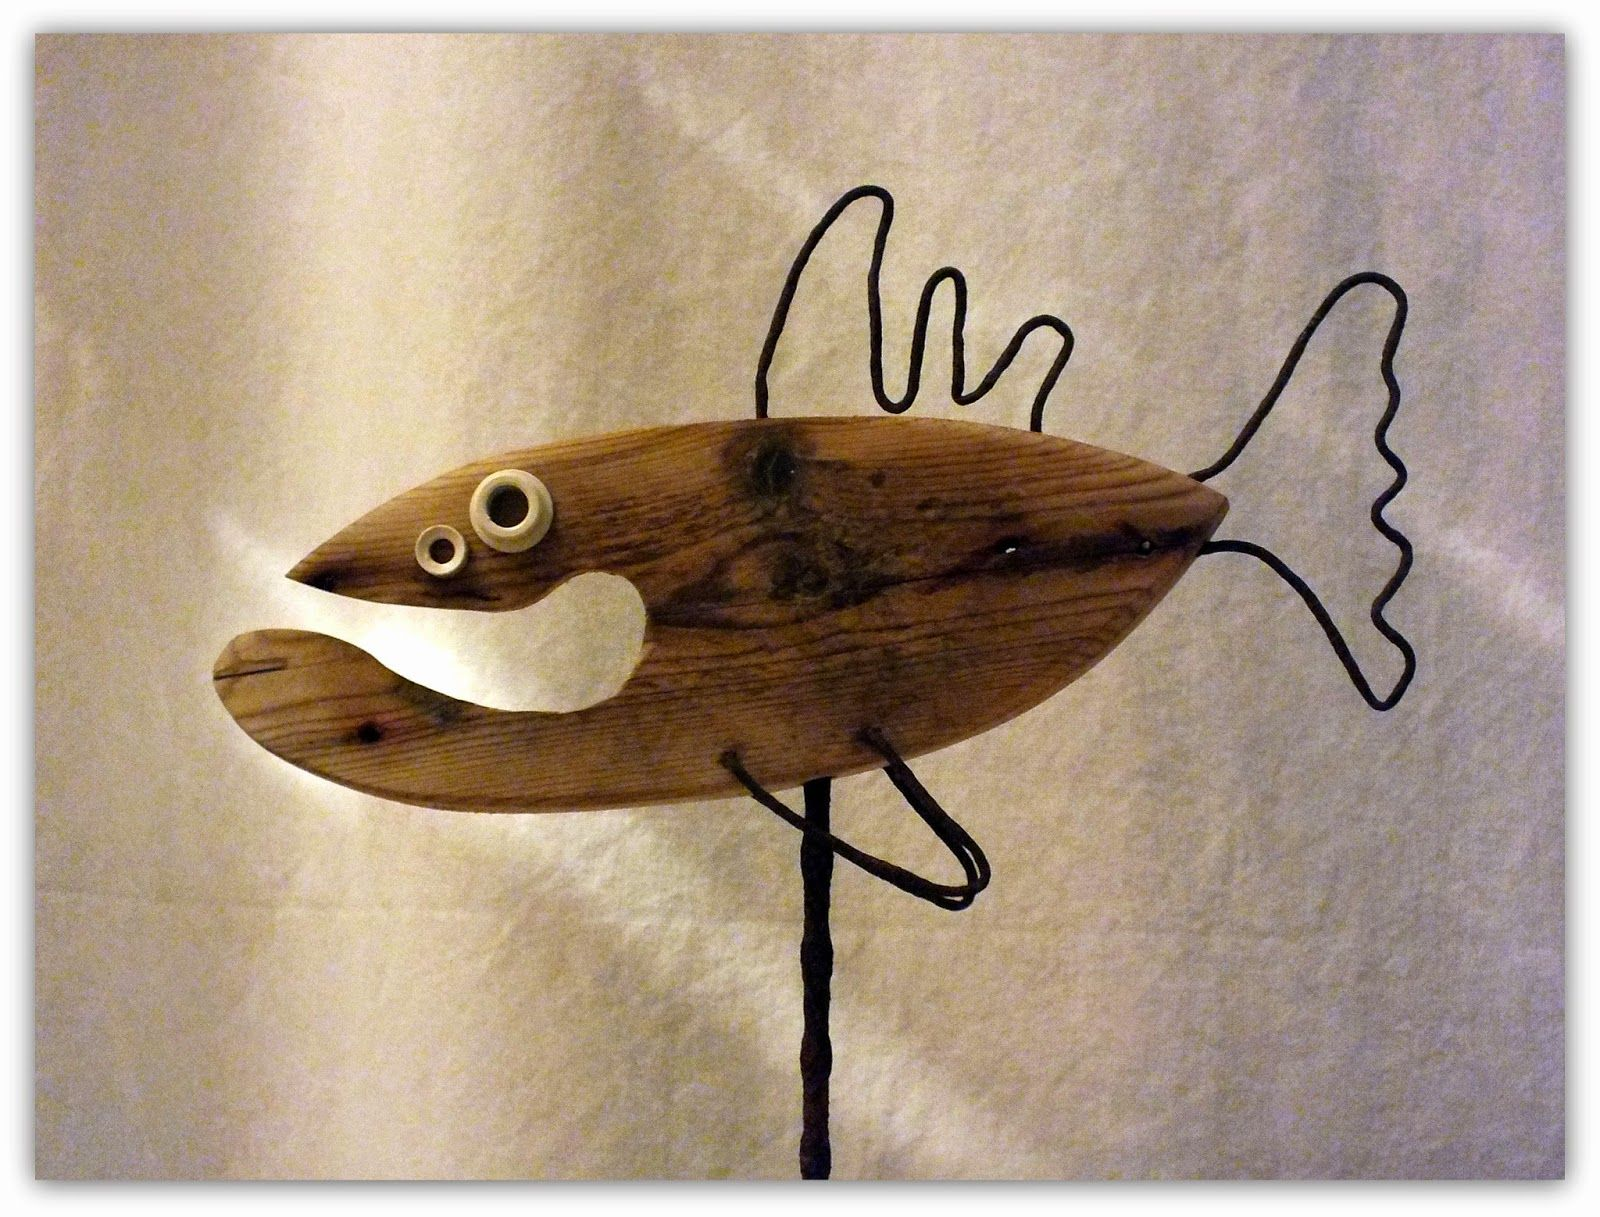 Poisson bois flotté | bois flotté | Pinterest | Driftwood, Driftwood ...